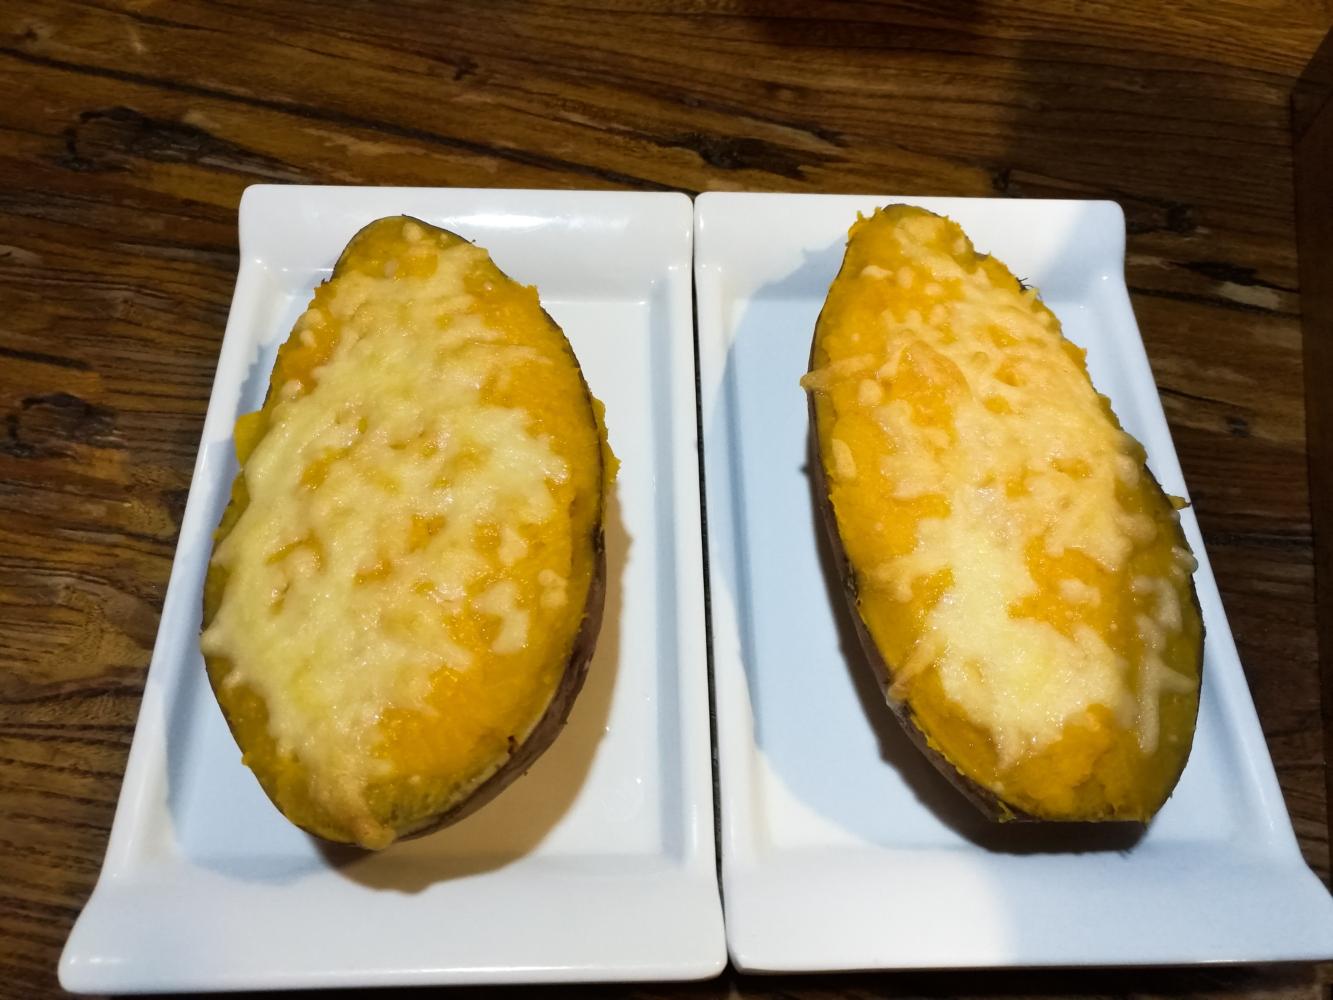 batata-doce recheada com queijo